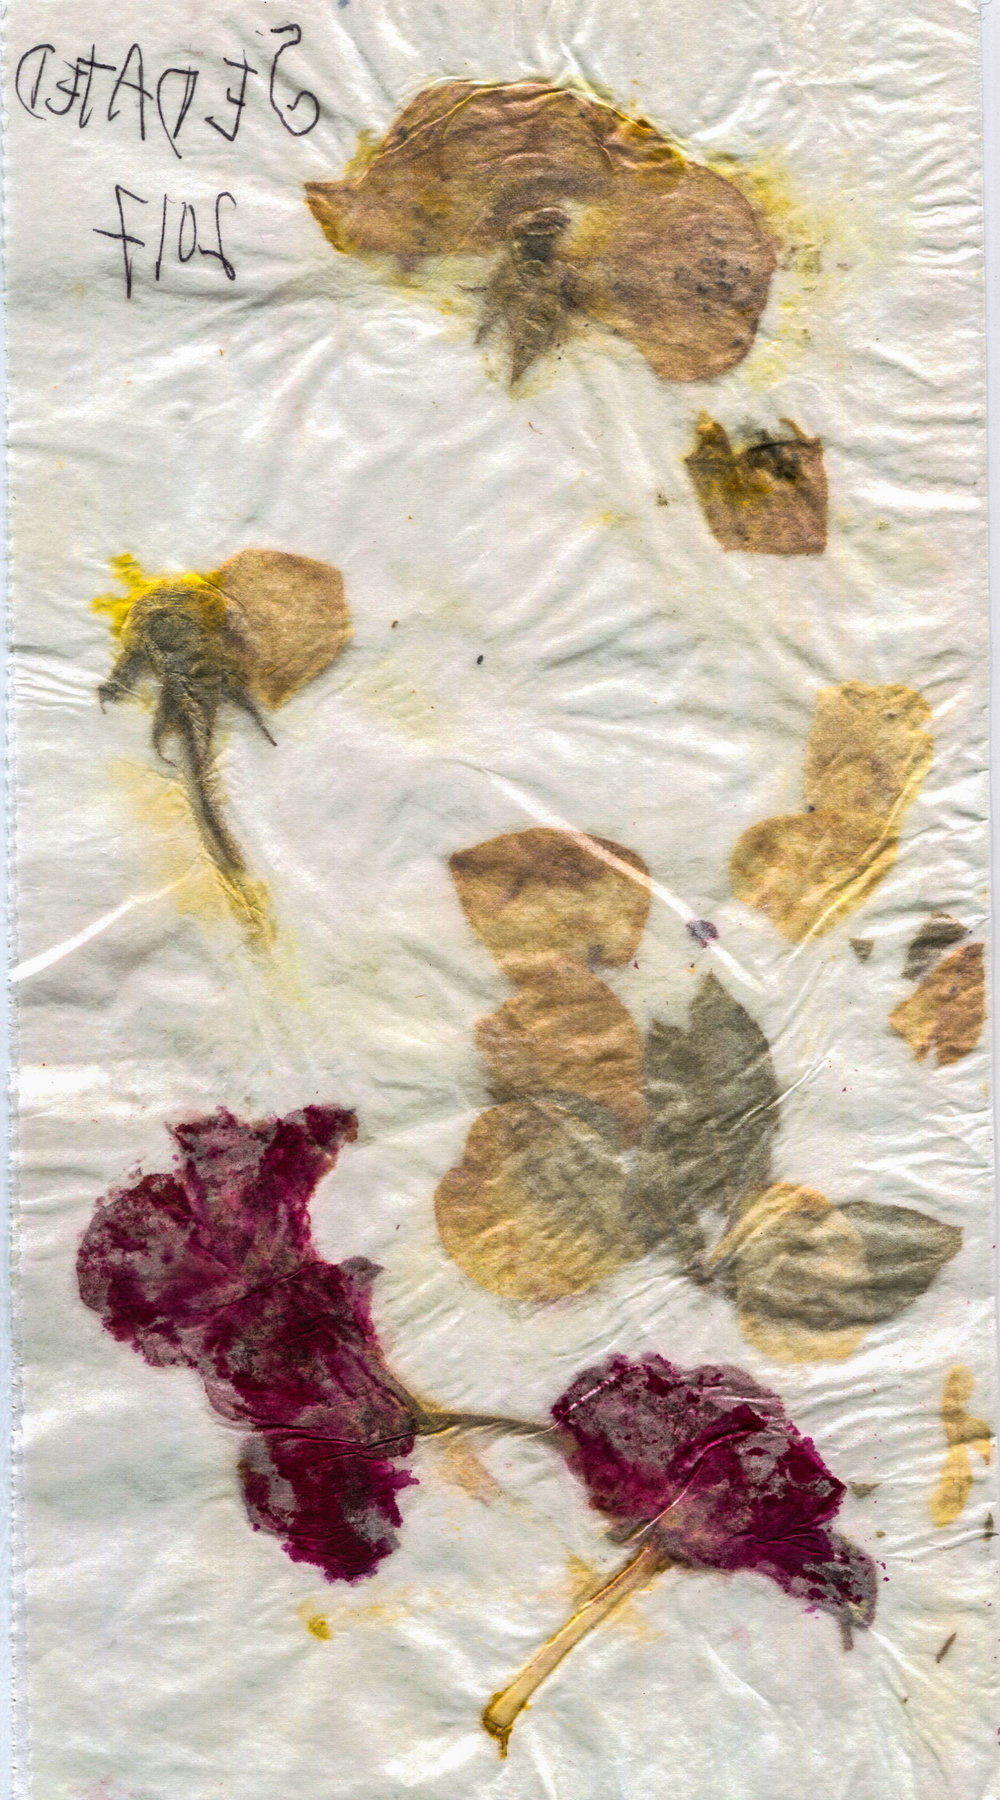 Sedated-2017-Pressed-Flowers.jpg